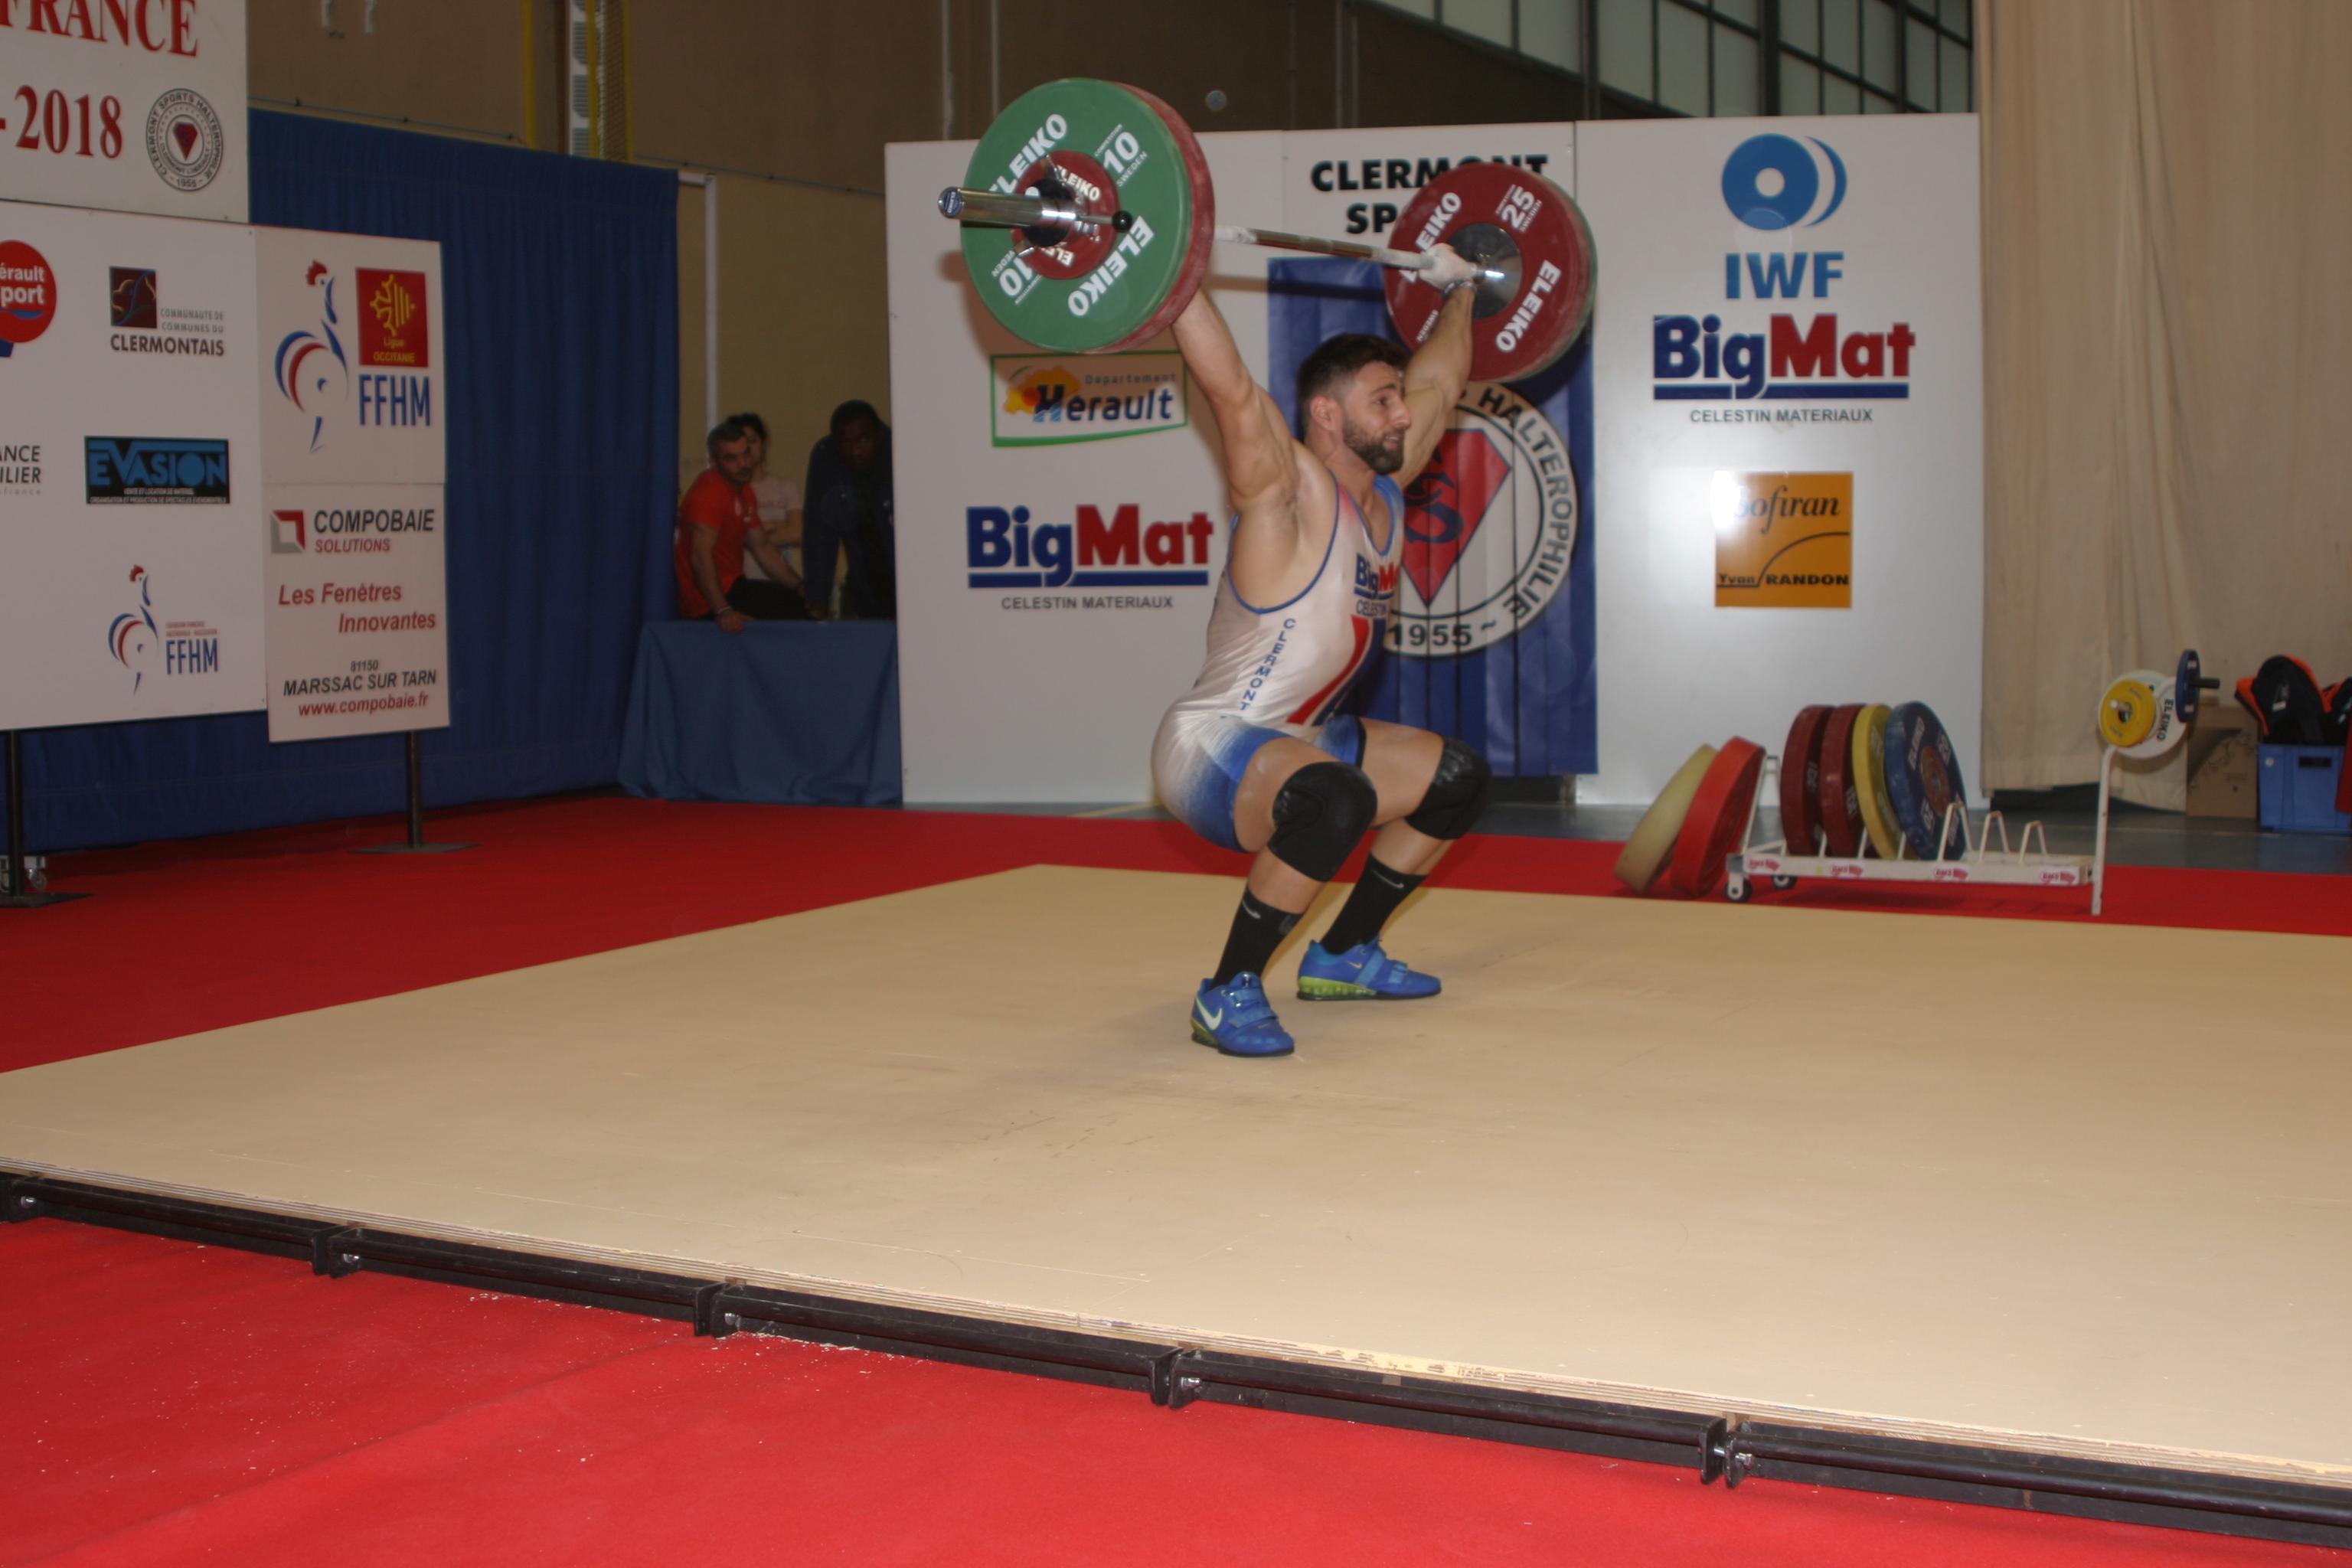 Clermont Sports Halterophilie